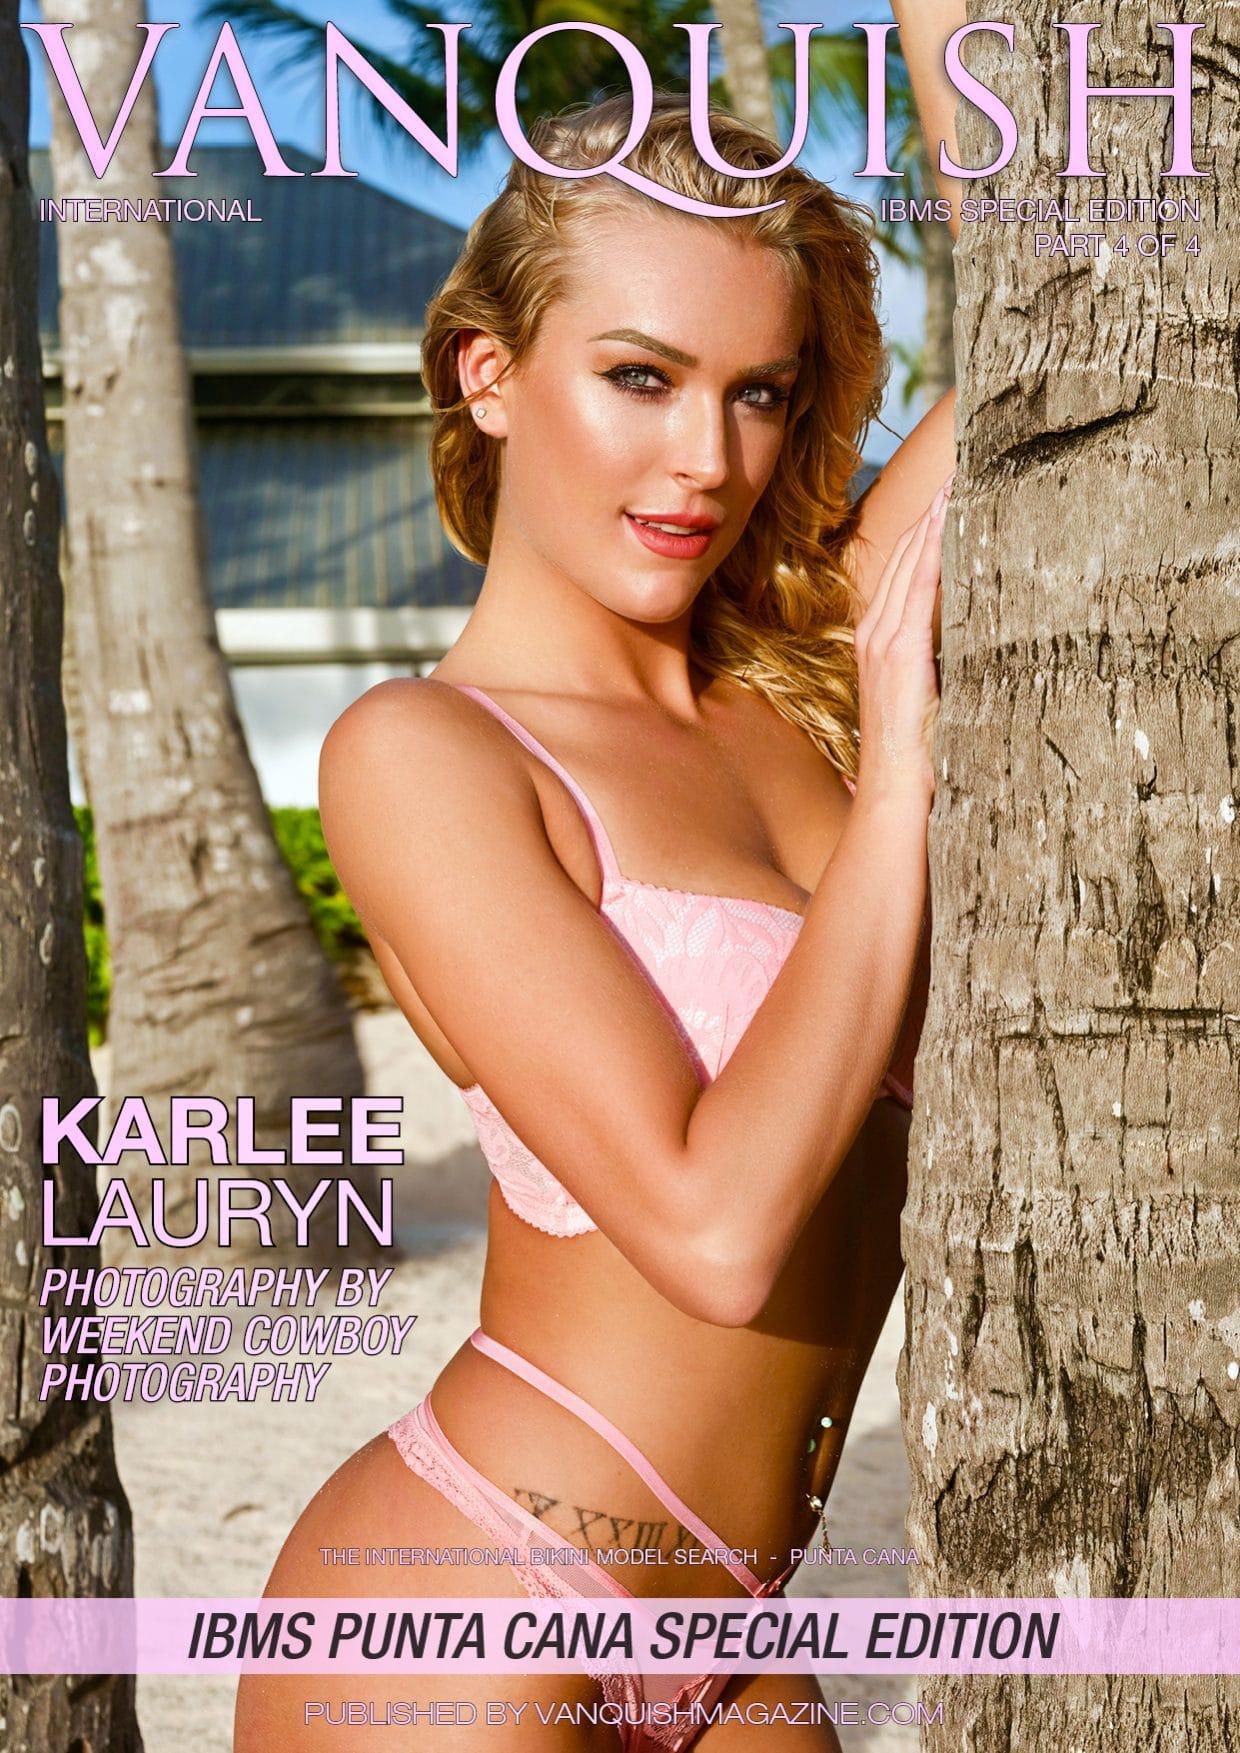 Vanquish Magazine - IBMS Punta Cana - Part 4 - Karlee Lauryn 1